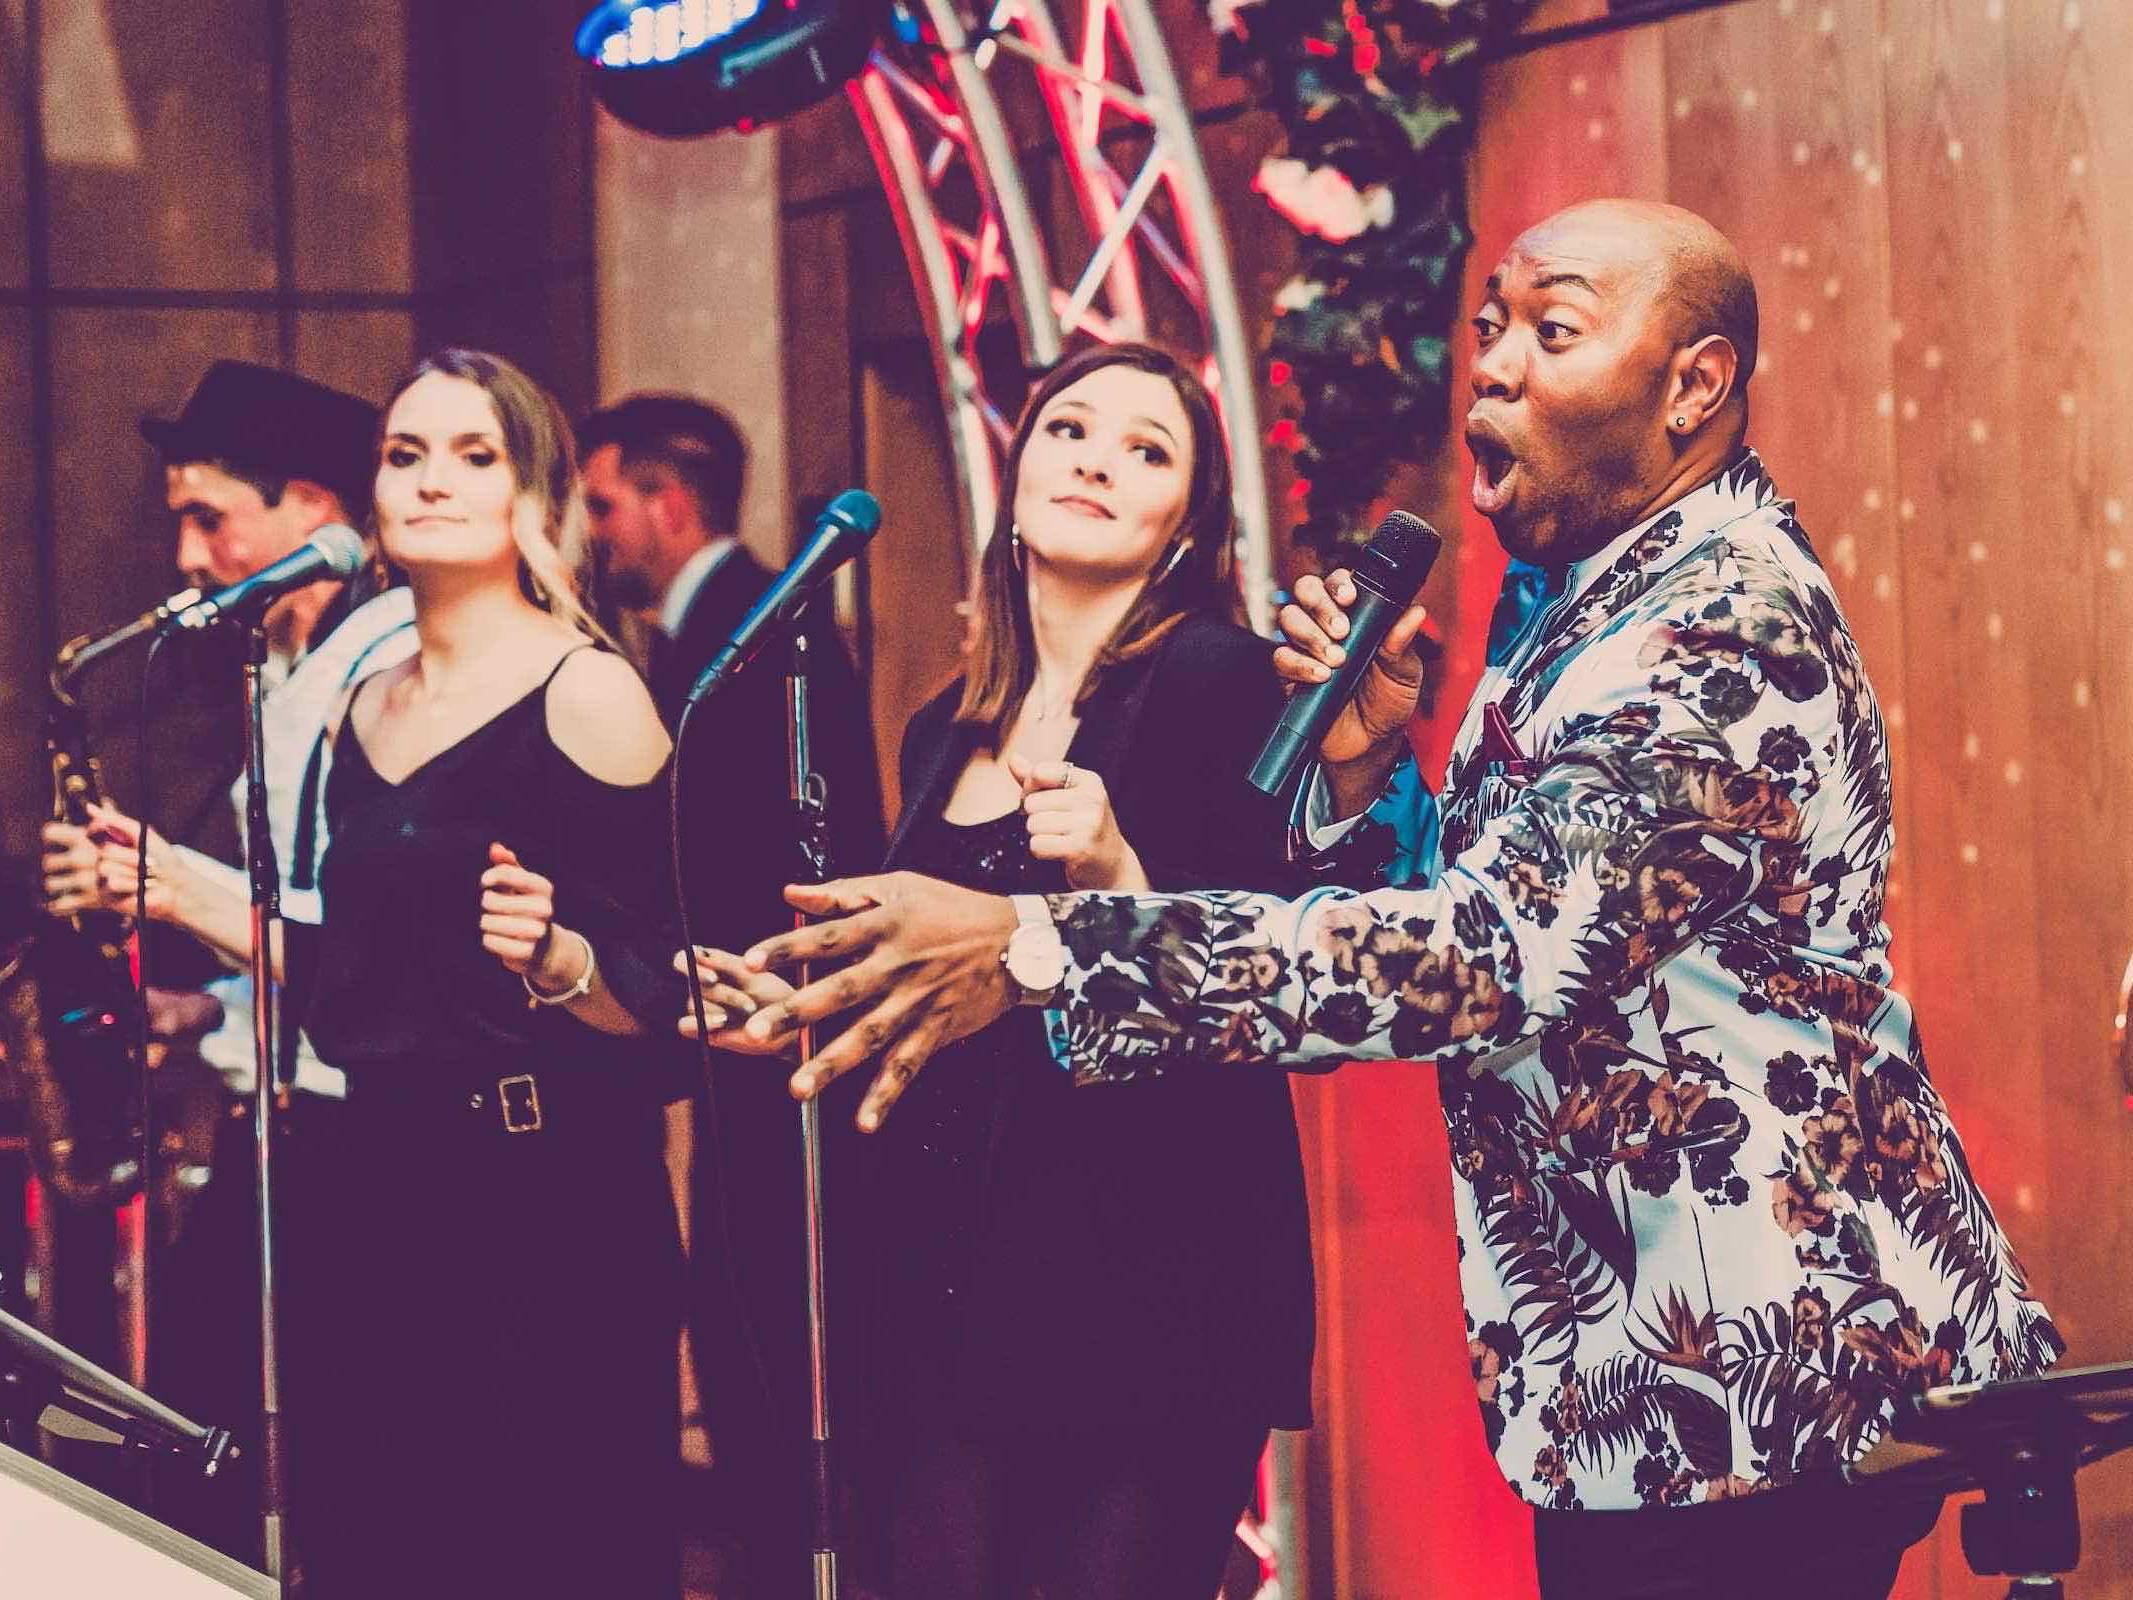 Band   Hamburg   Liveband   Livemusik   Brassband   Samba   Partyband   Jazzband   Swingband   Lounge   Popband   Jazz   Gesang   Sänger   Frontsänger   Hochzeit   Trauung   Messe   Firmenfeier   Charity   Gala   Hamburgfeiert